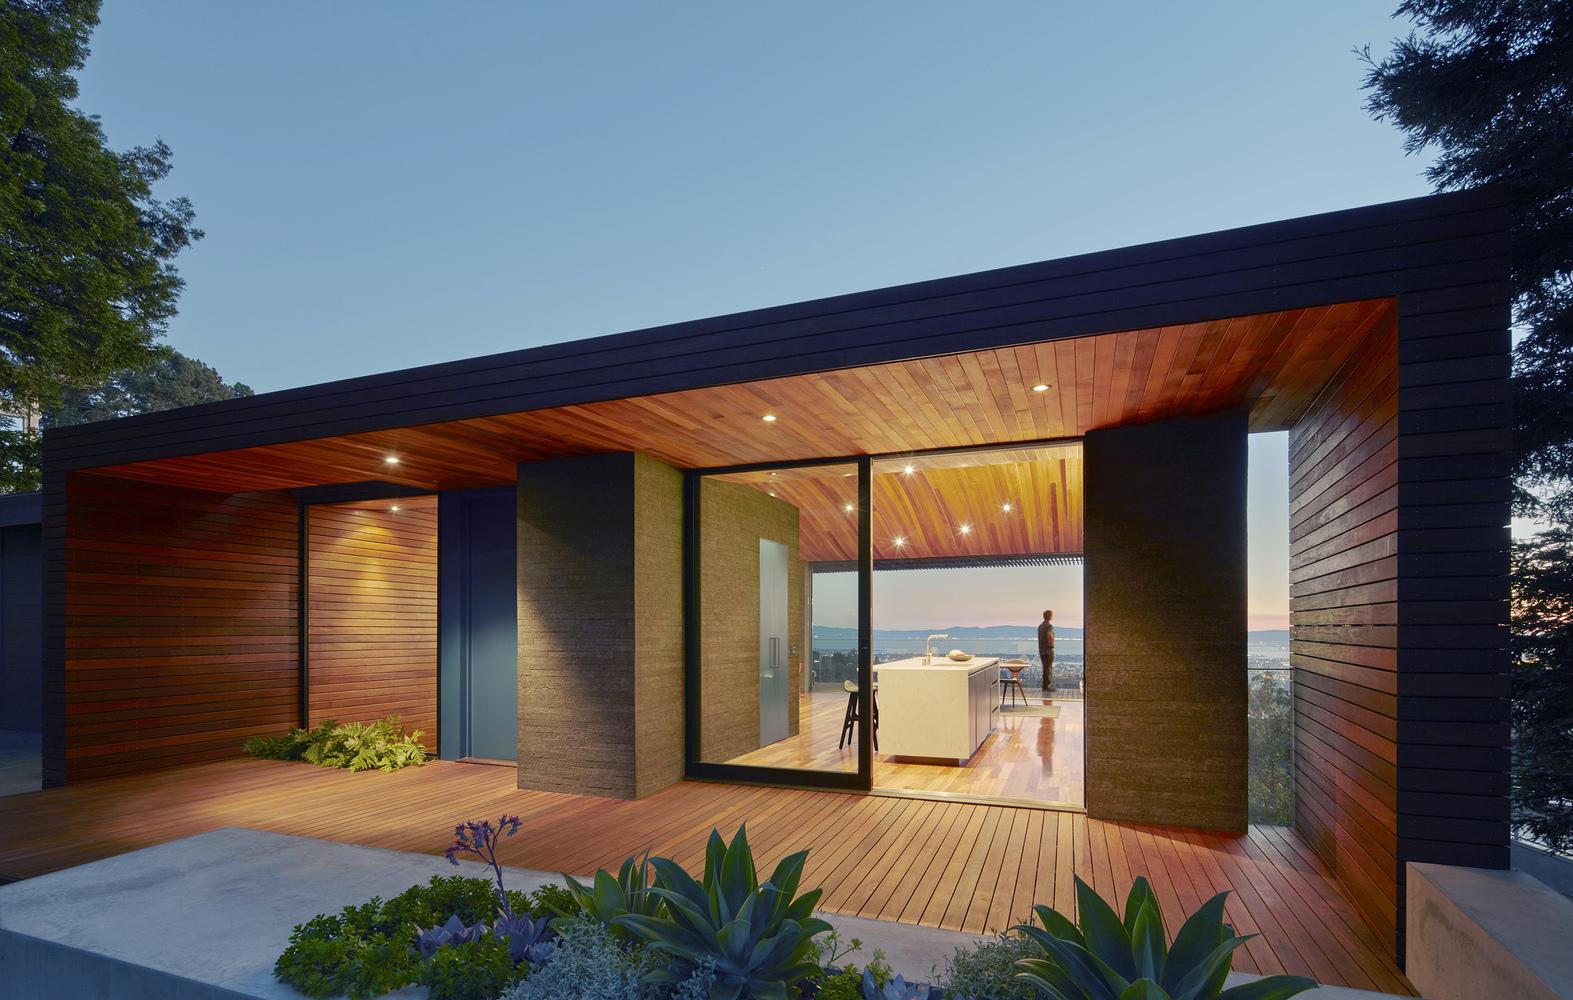 Casa Horizonte una construccin super moderna con interiores